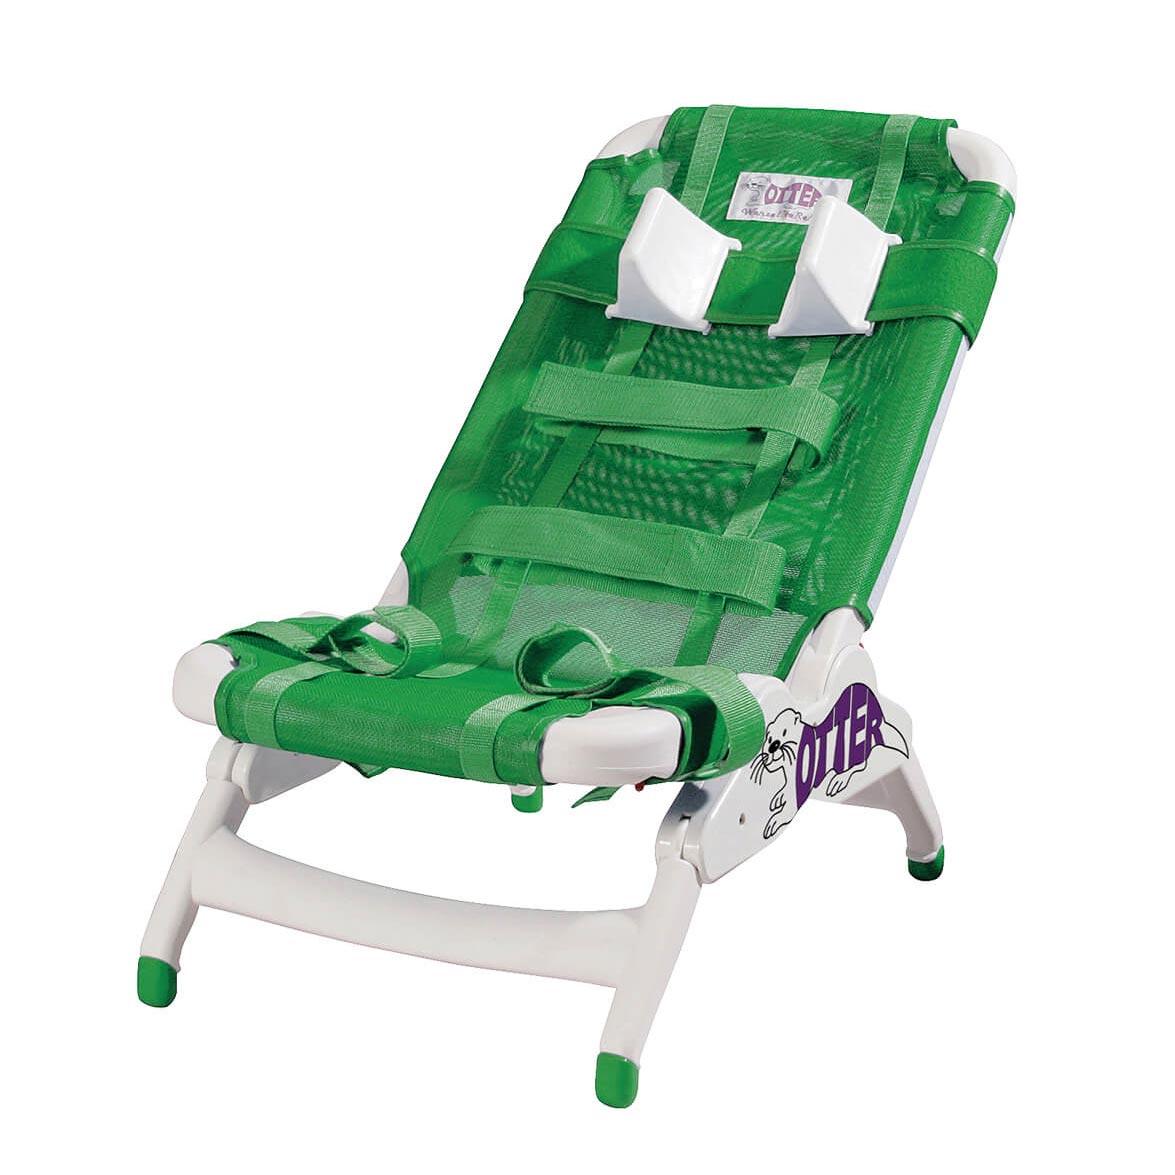 Drive Medical Otter Pediatric bath